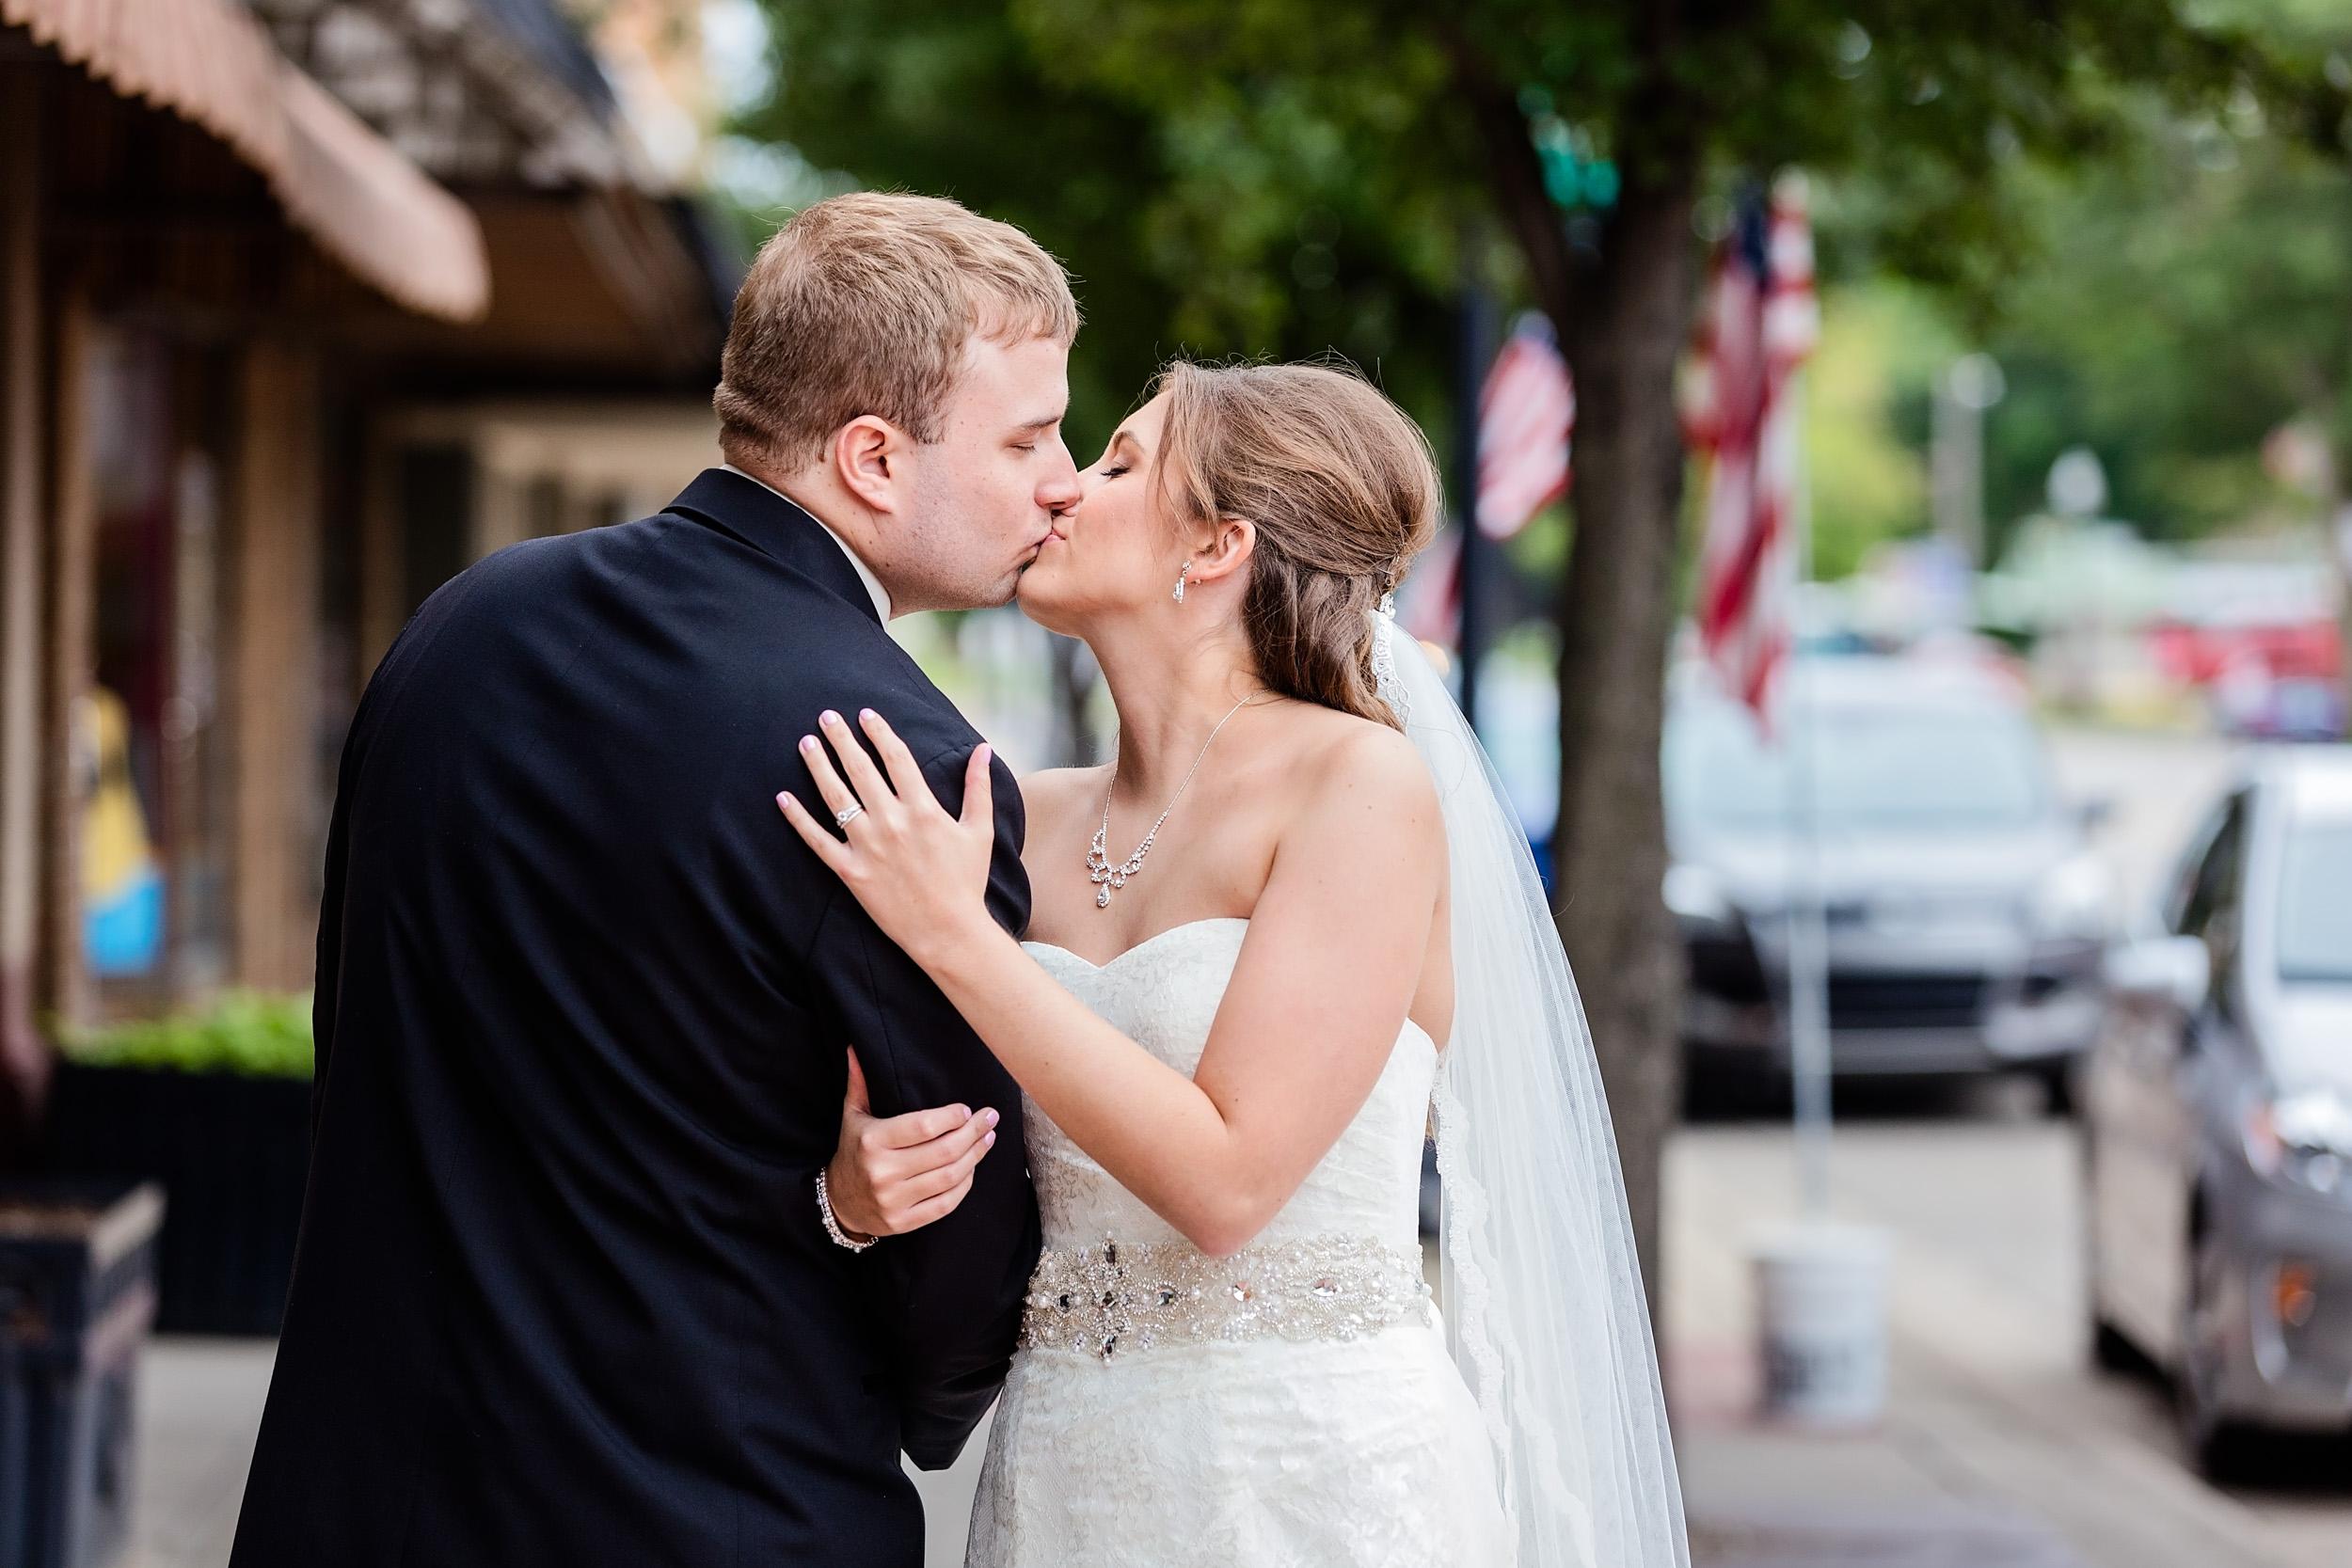 Hart_wedding_blog-32.jpg